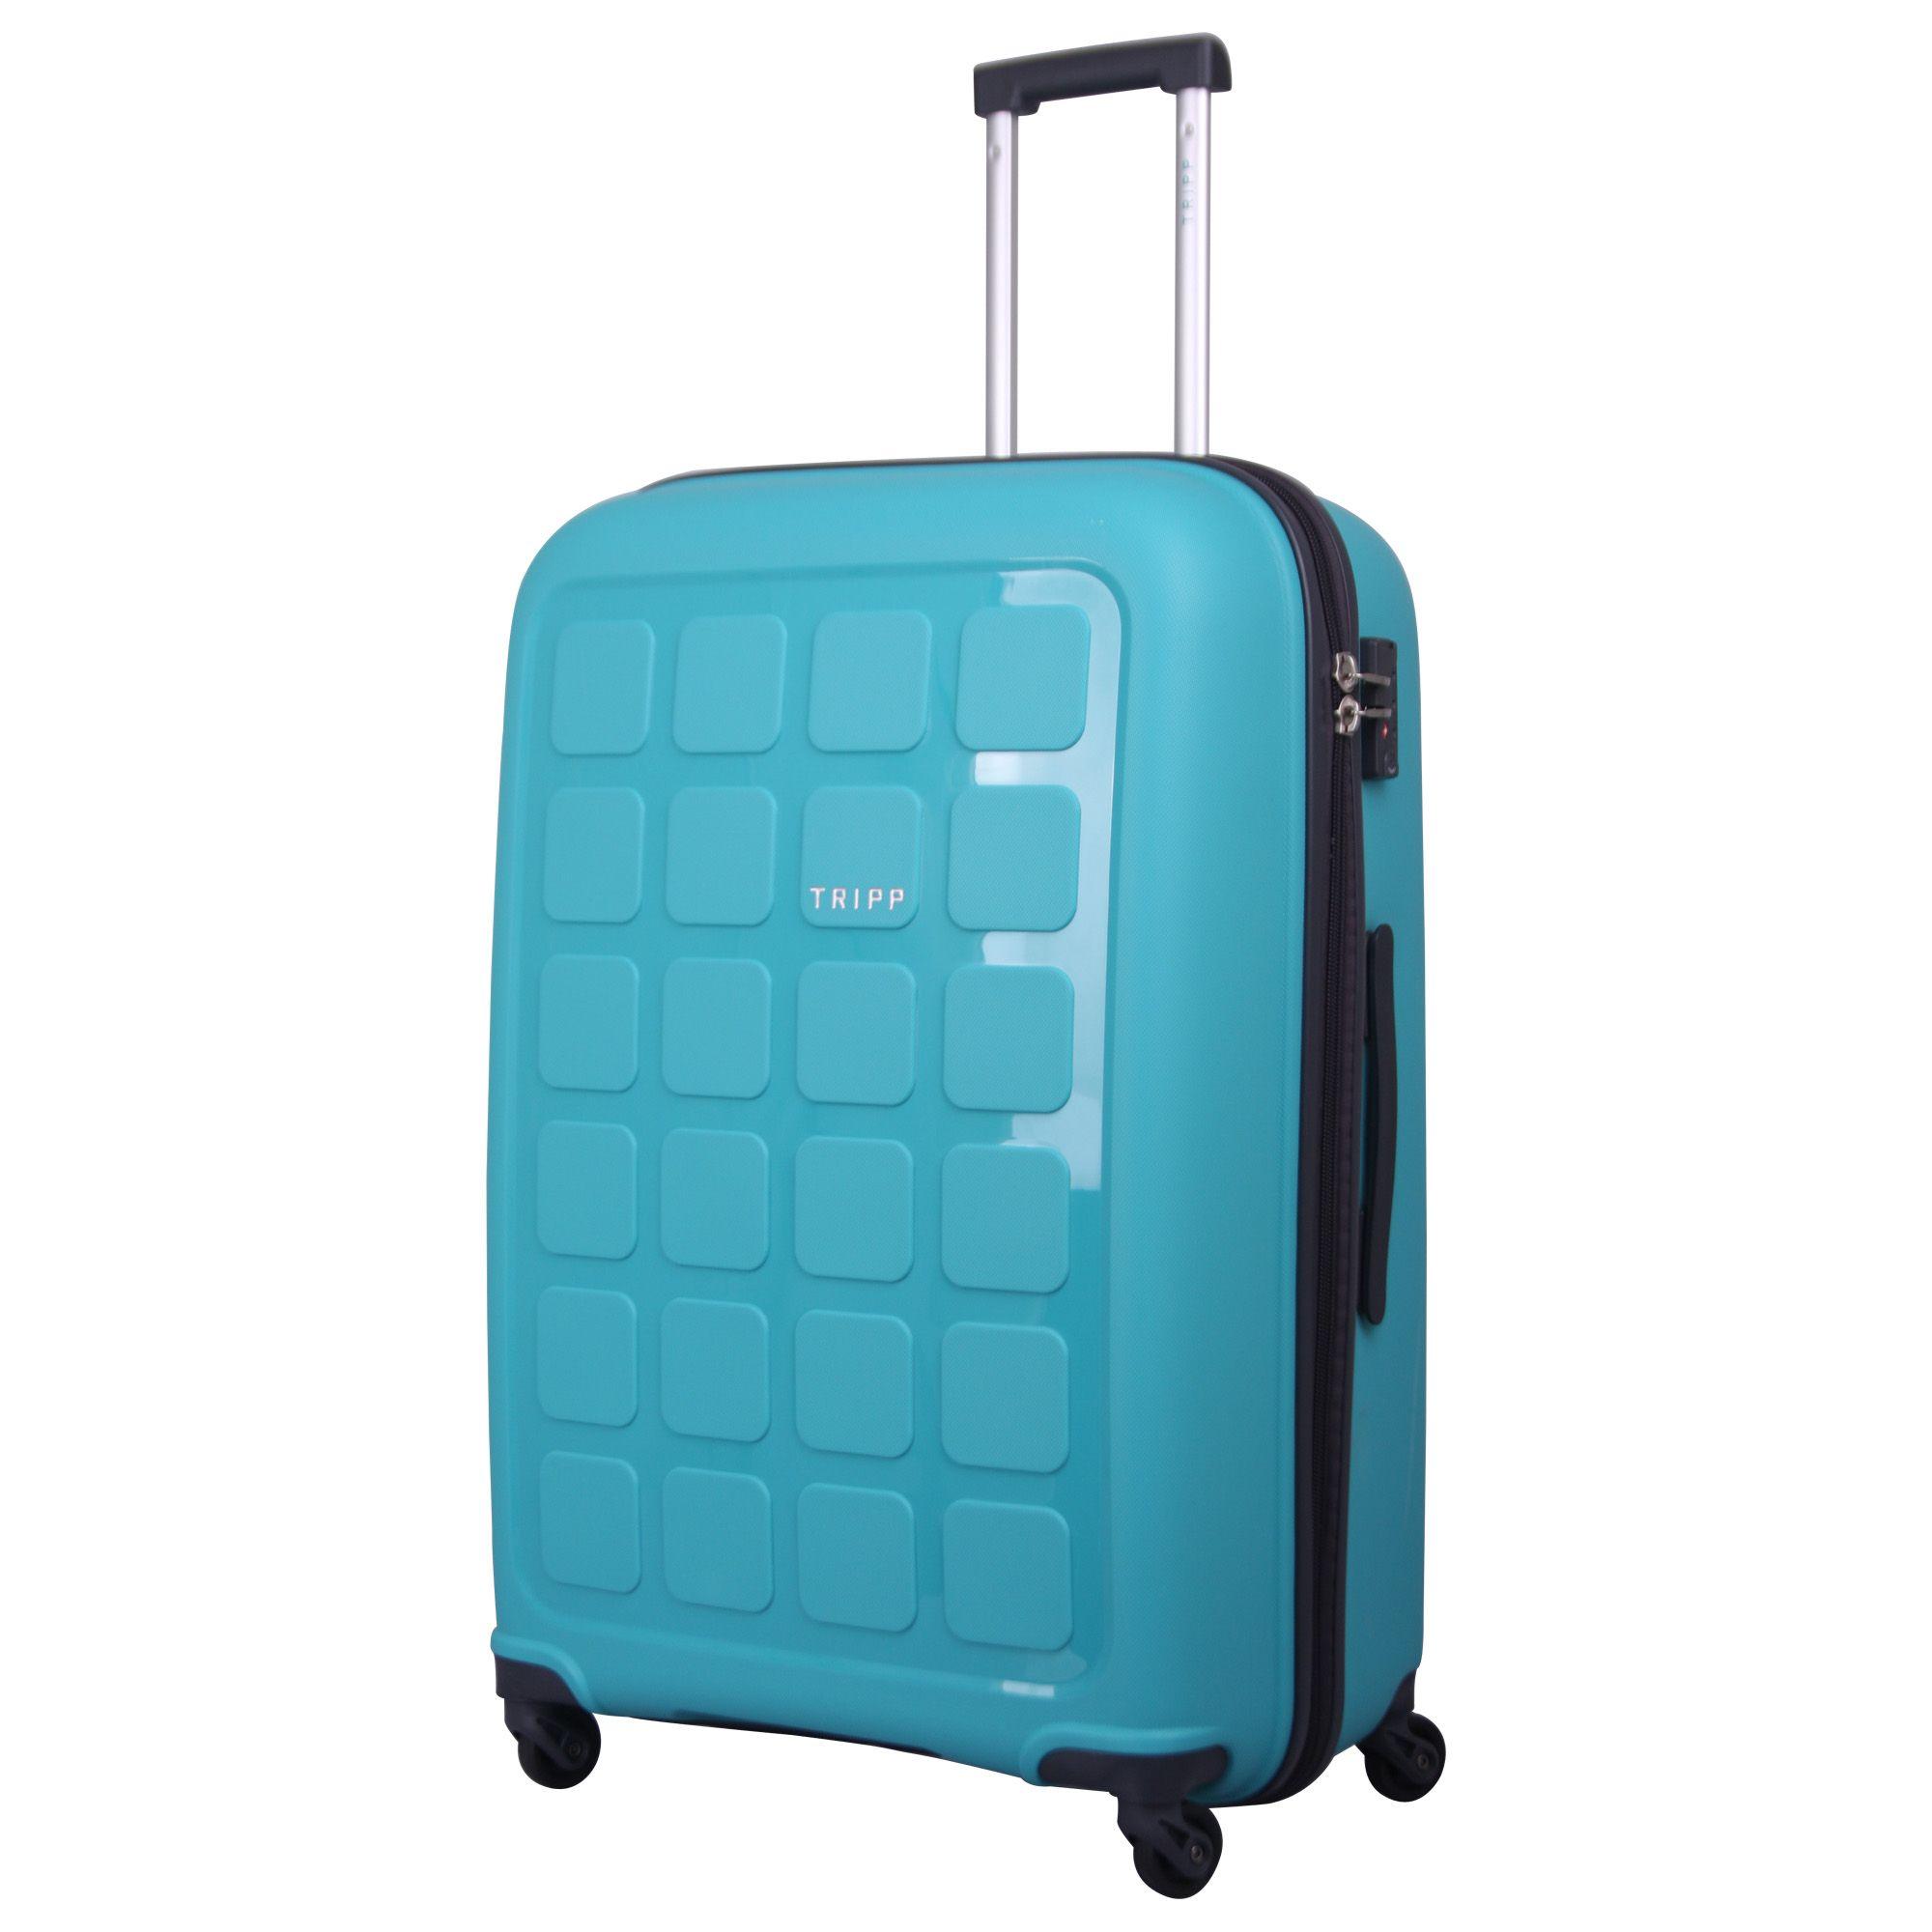 tripp mint 39 holiday 6 39 large 4 wheel suitcase hard. Black Bedroom Furniture Sets. Home Design Ideas